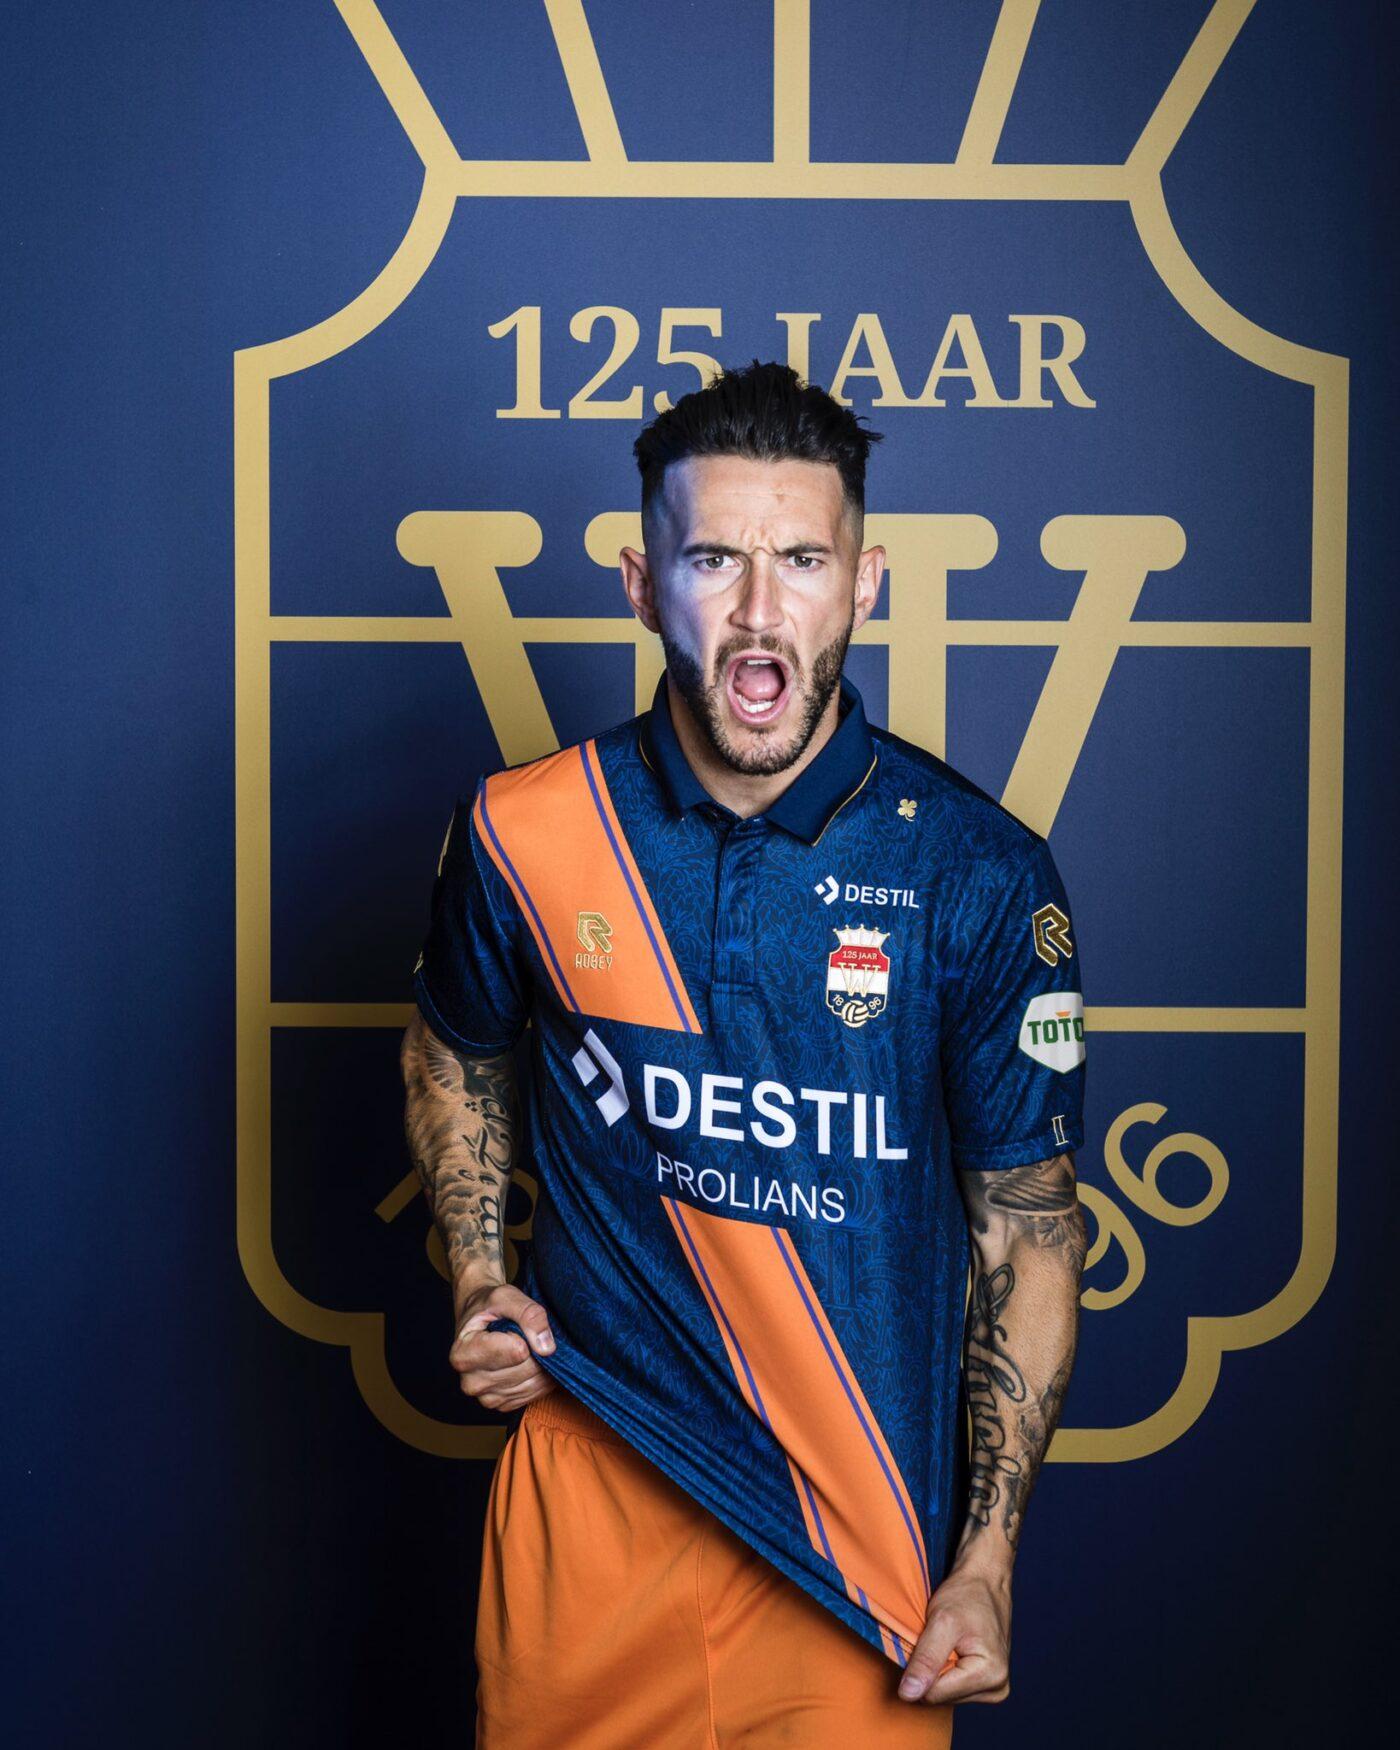 Maillot Willem II 125ème anniversaire 2021-2022